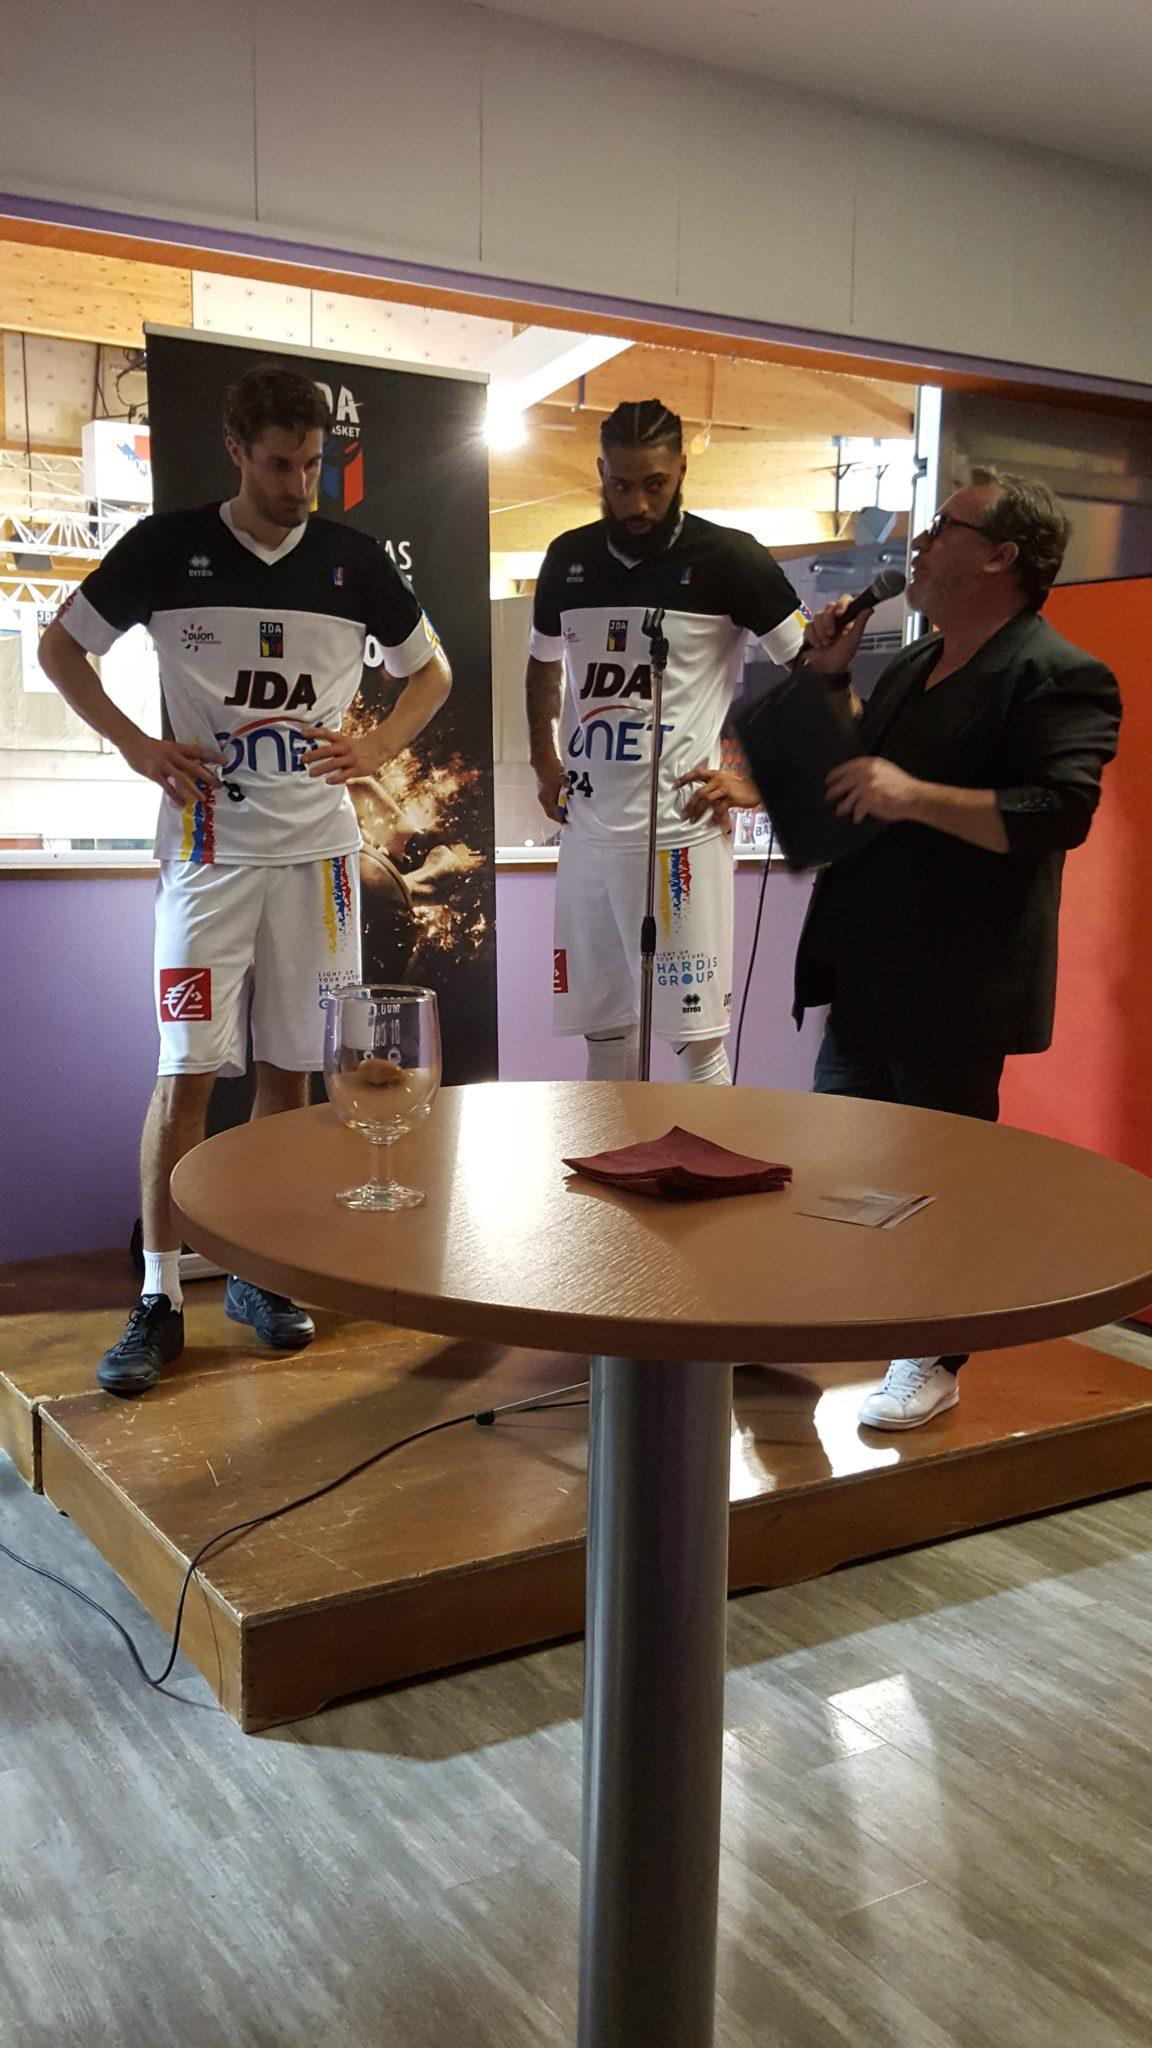 salon strasbourg 7 jda dijon basket